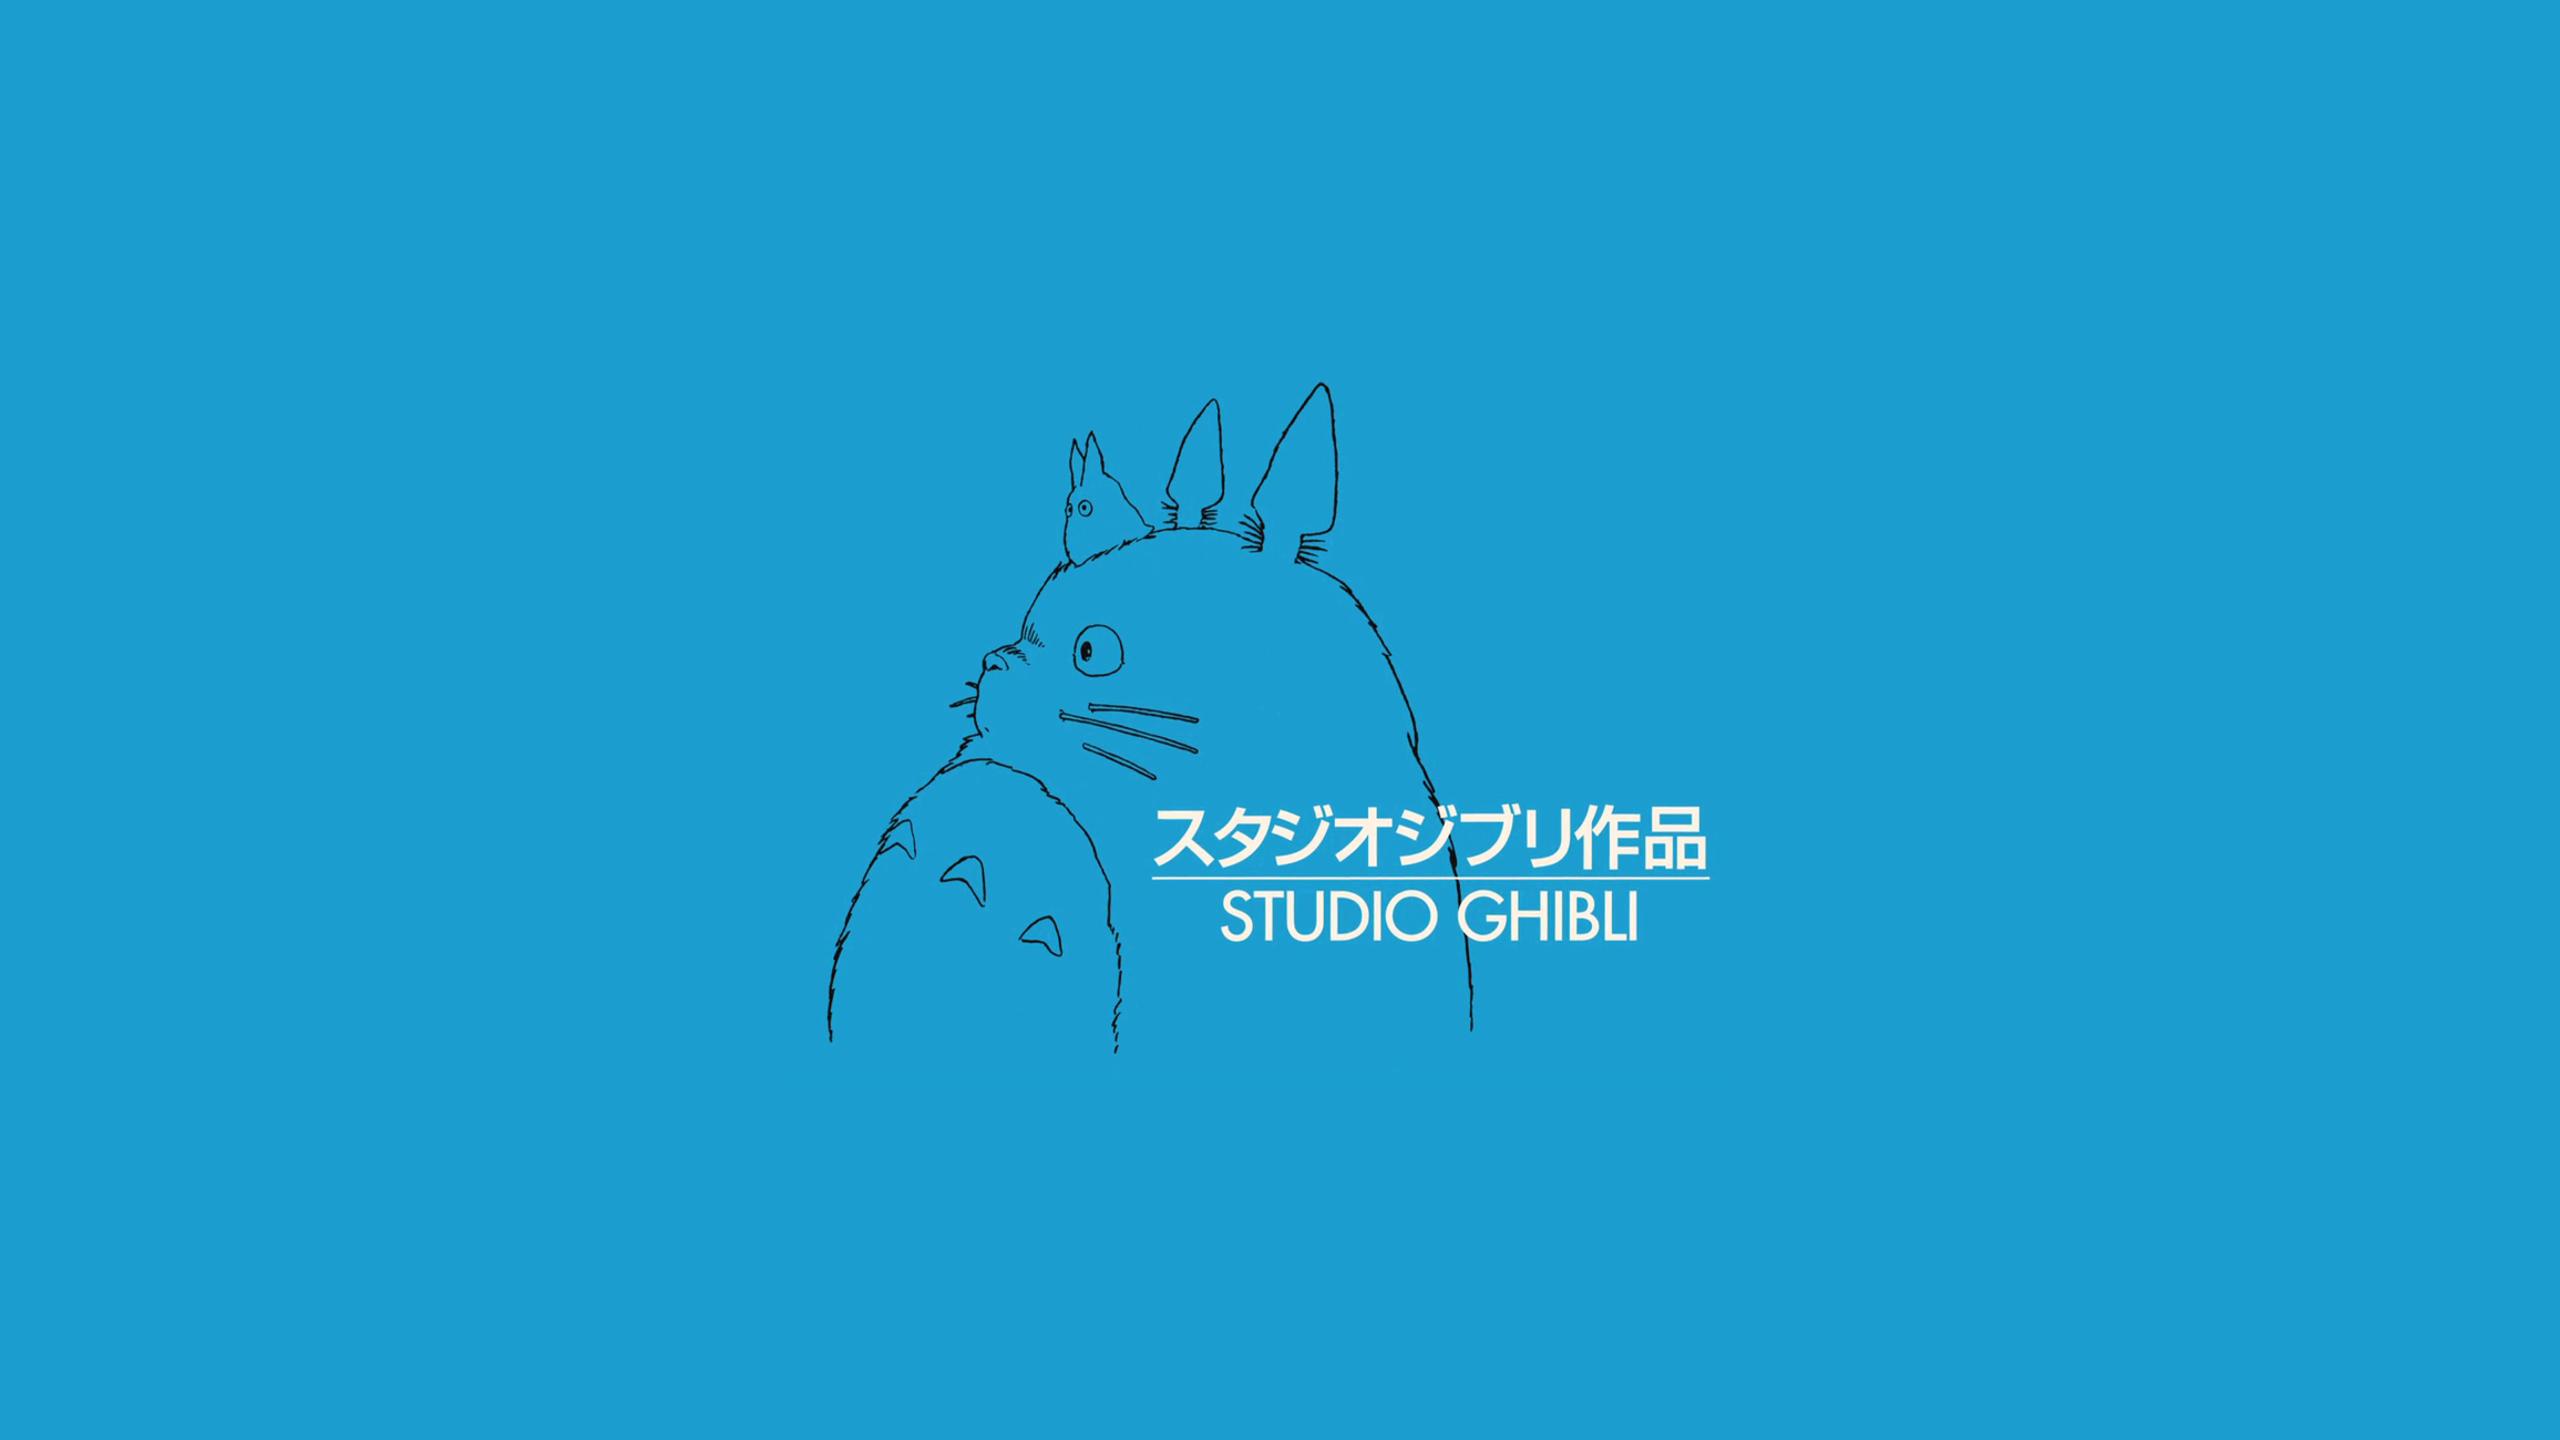 Ghibli Wallpapers 2560x1440